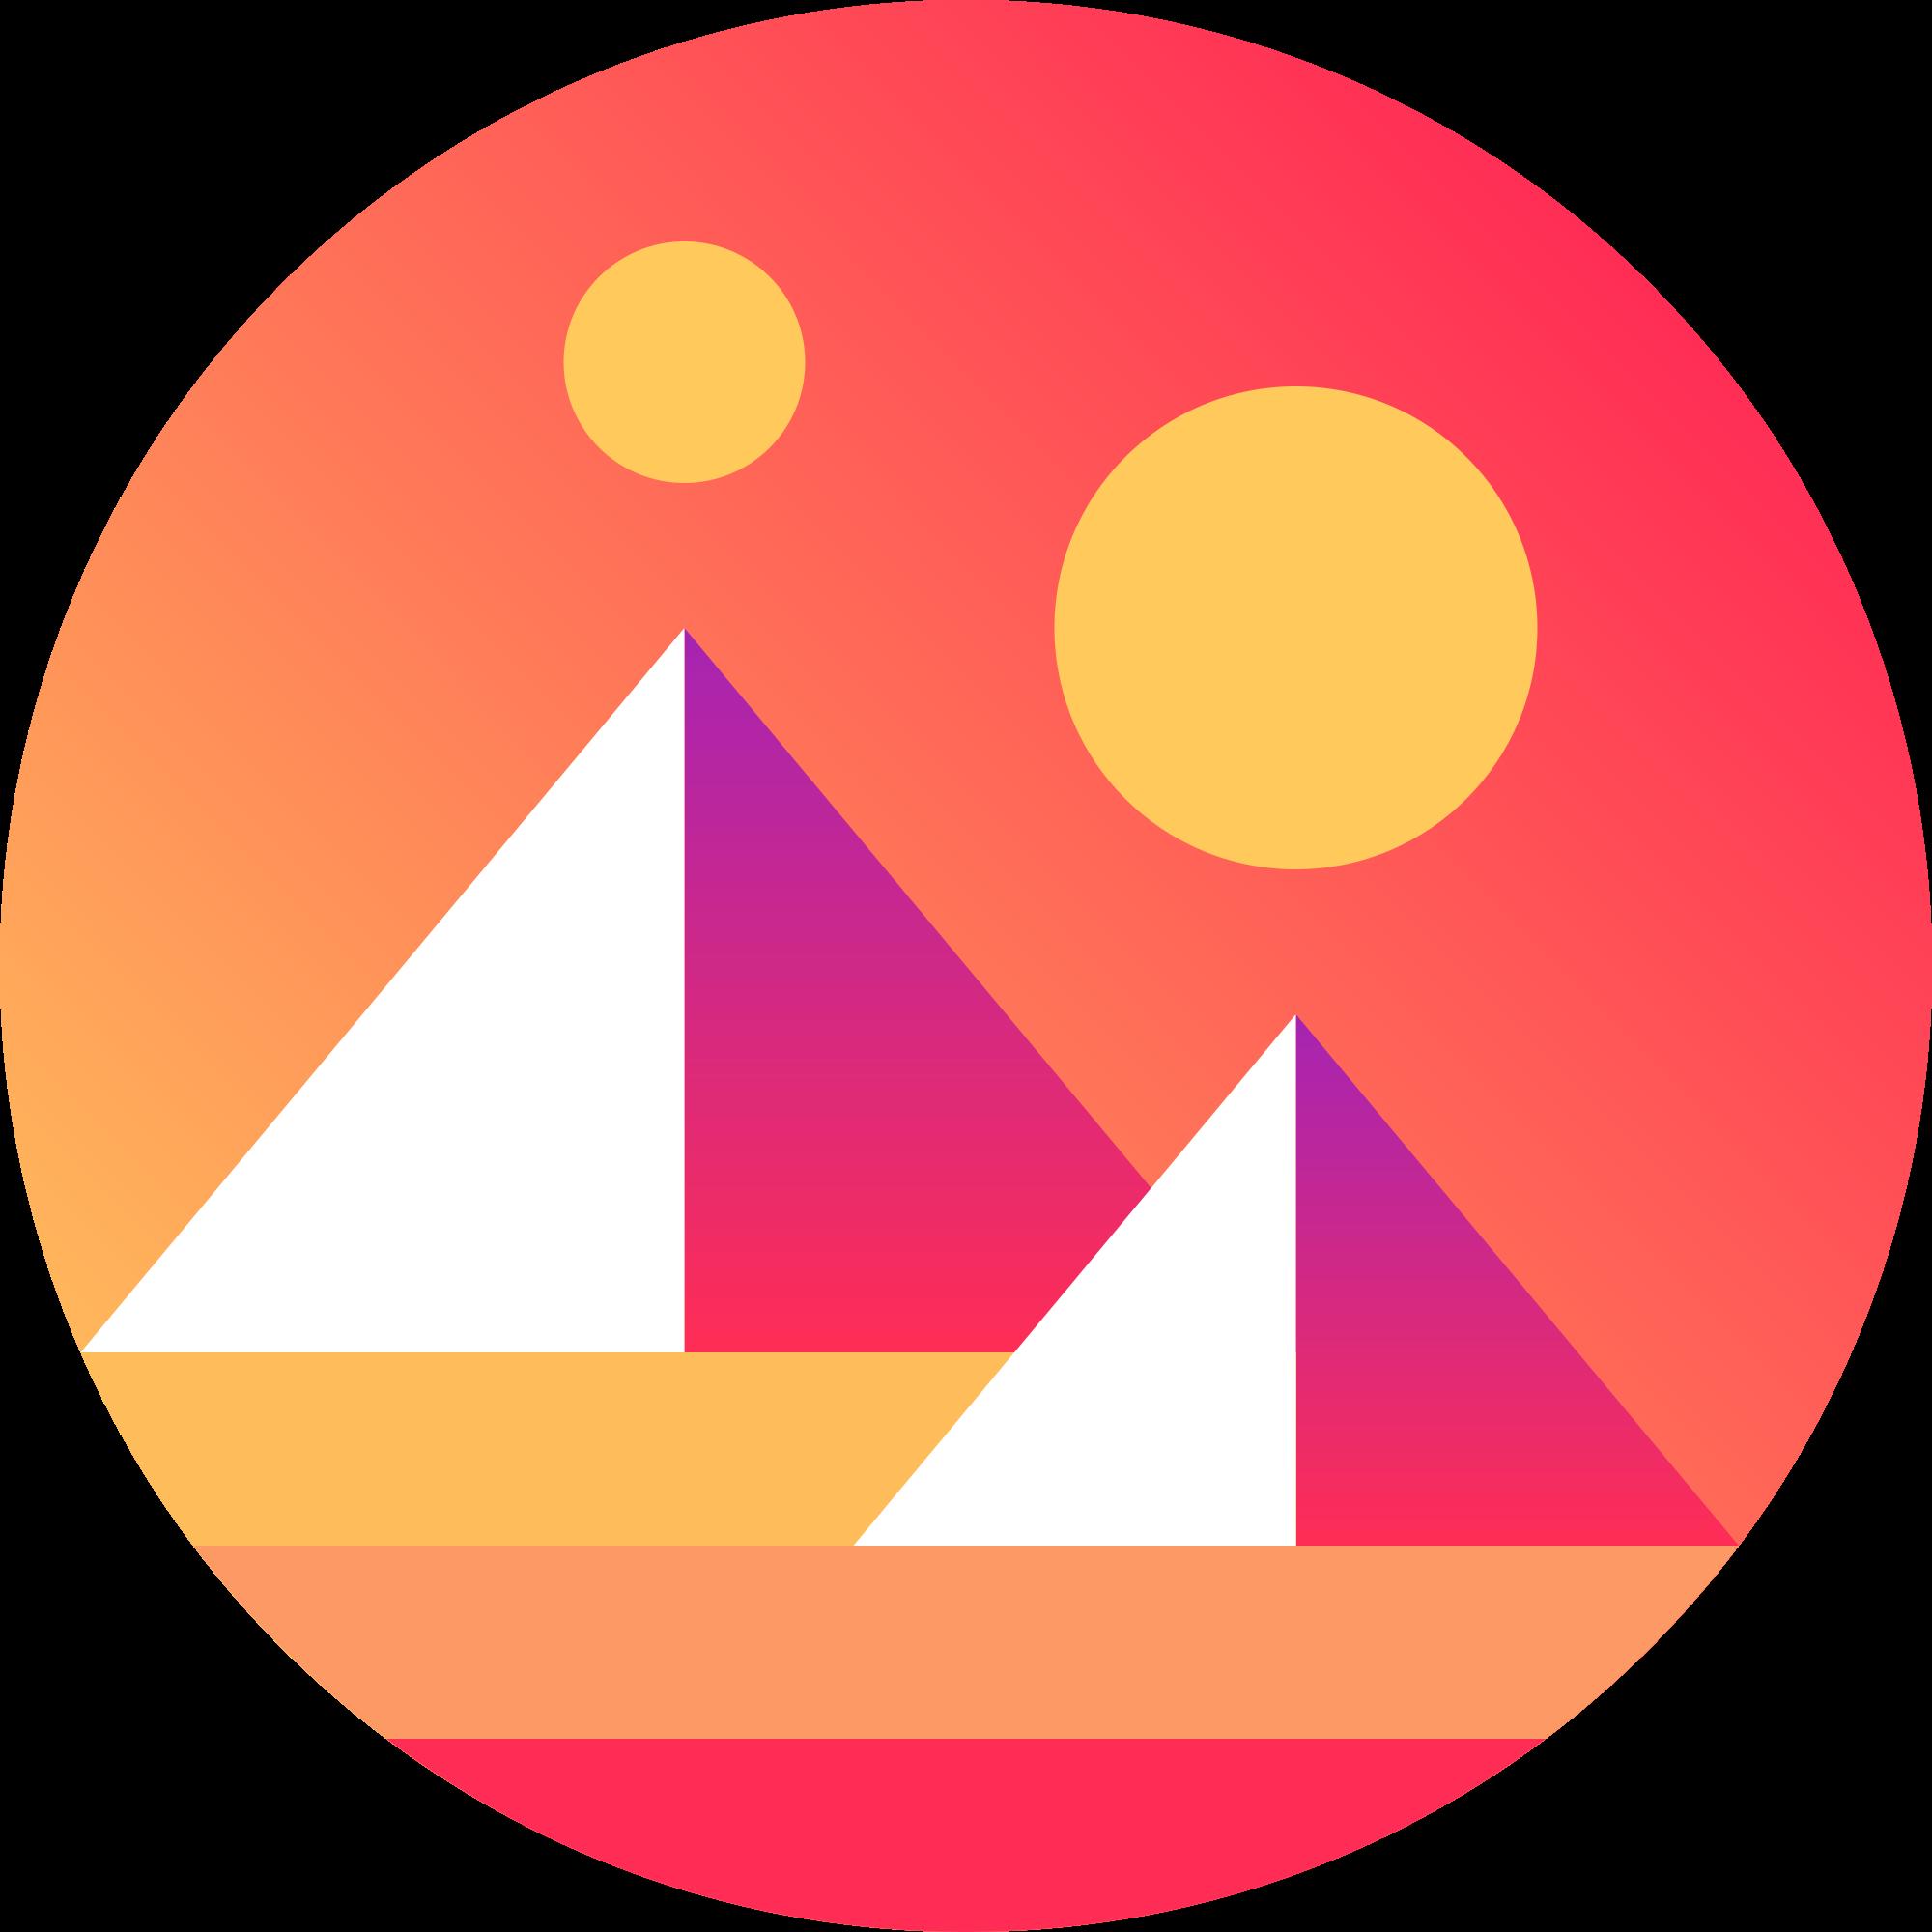 Decentraland (MANA) Logo .SVG and .PNG Files Download